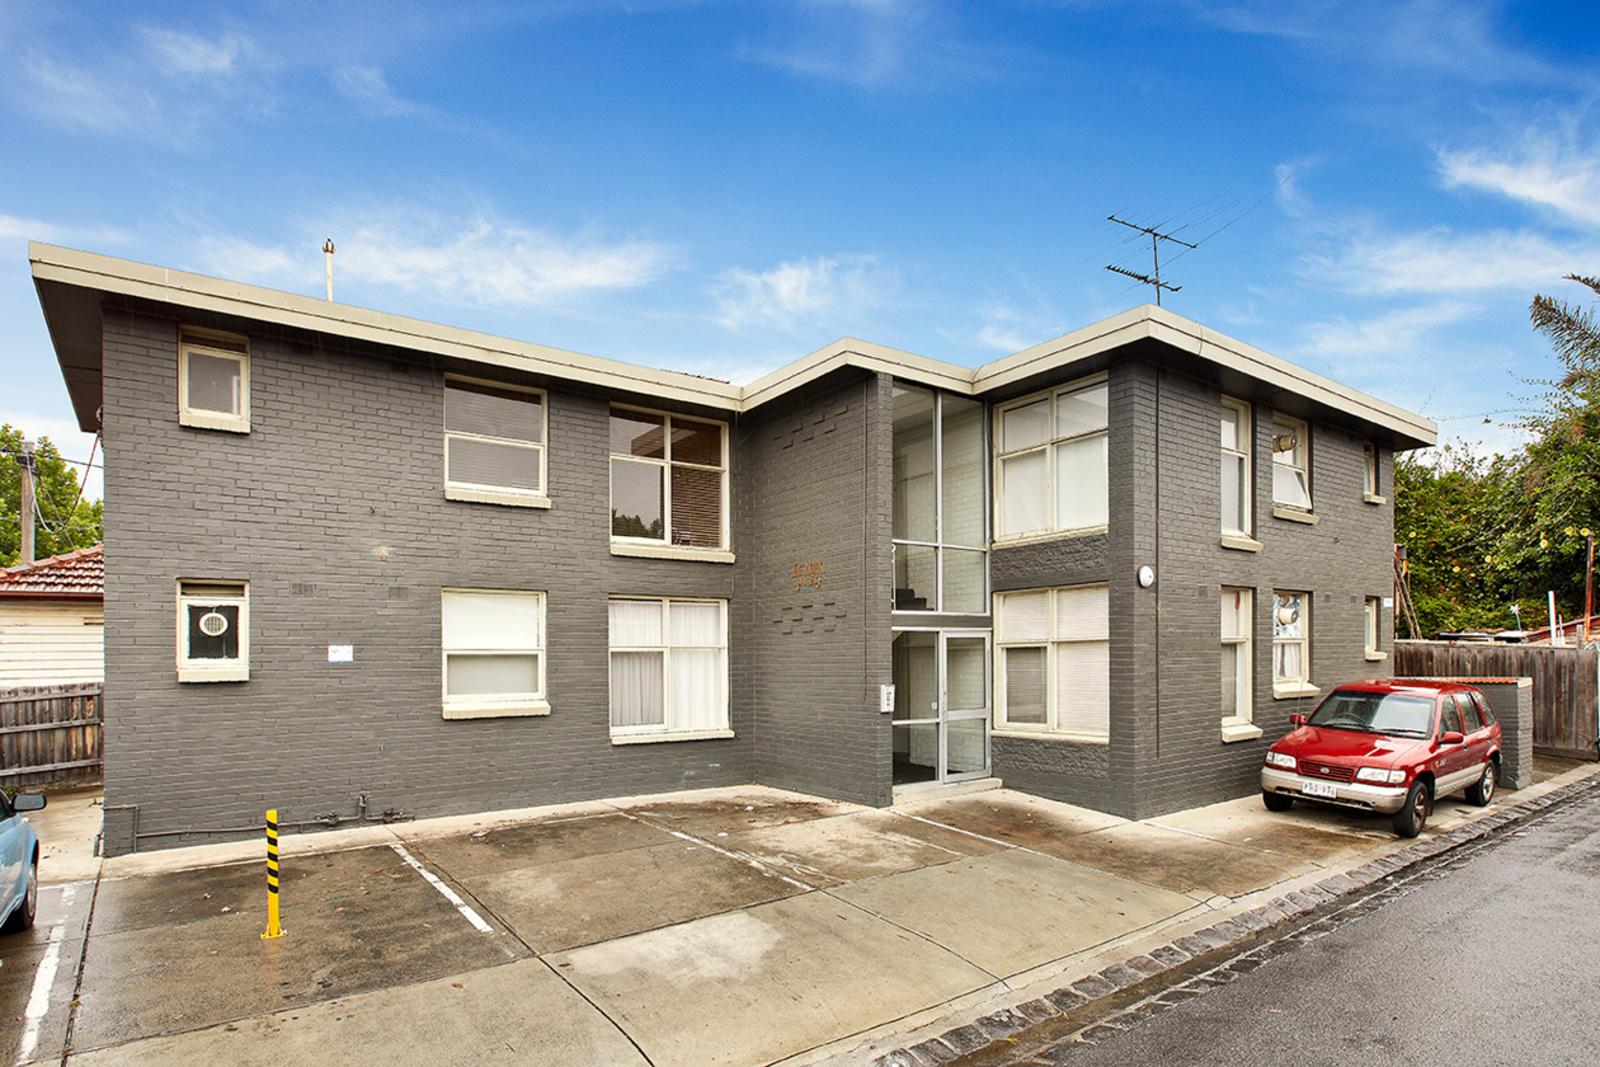 6/241 Nicholson Street, Abbotsford VIC 3067, Image 0